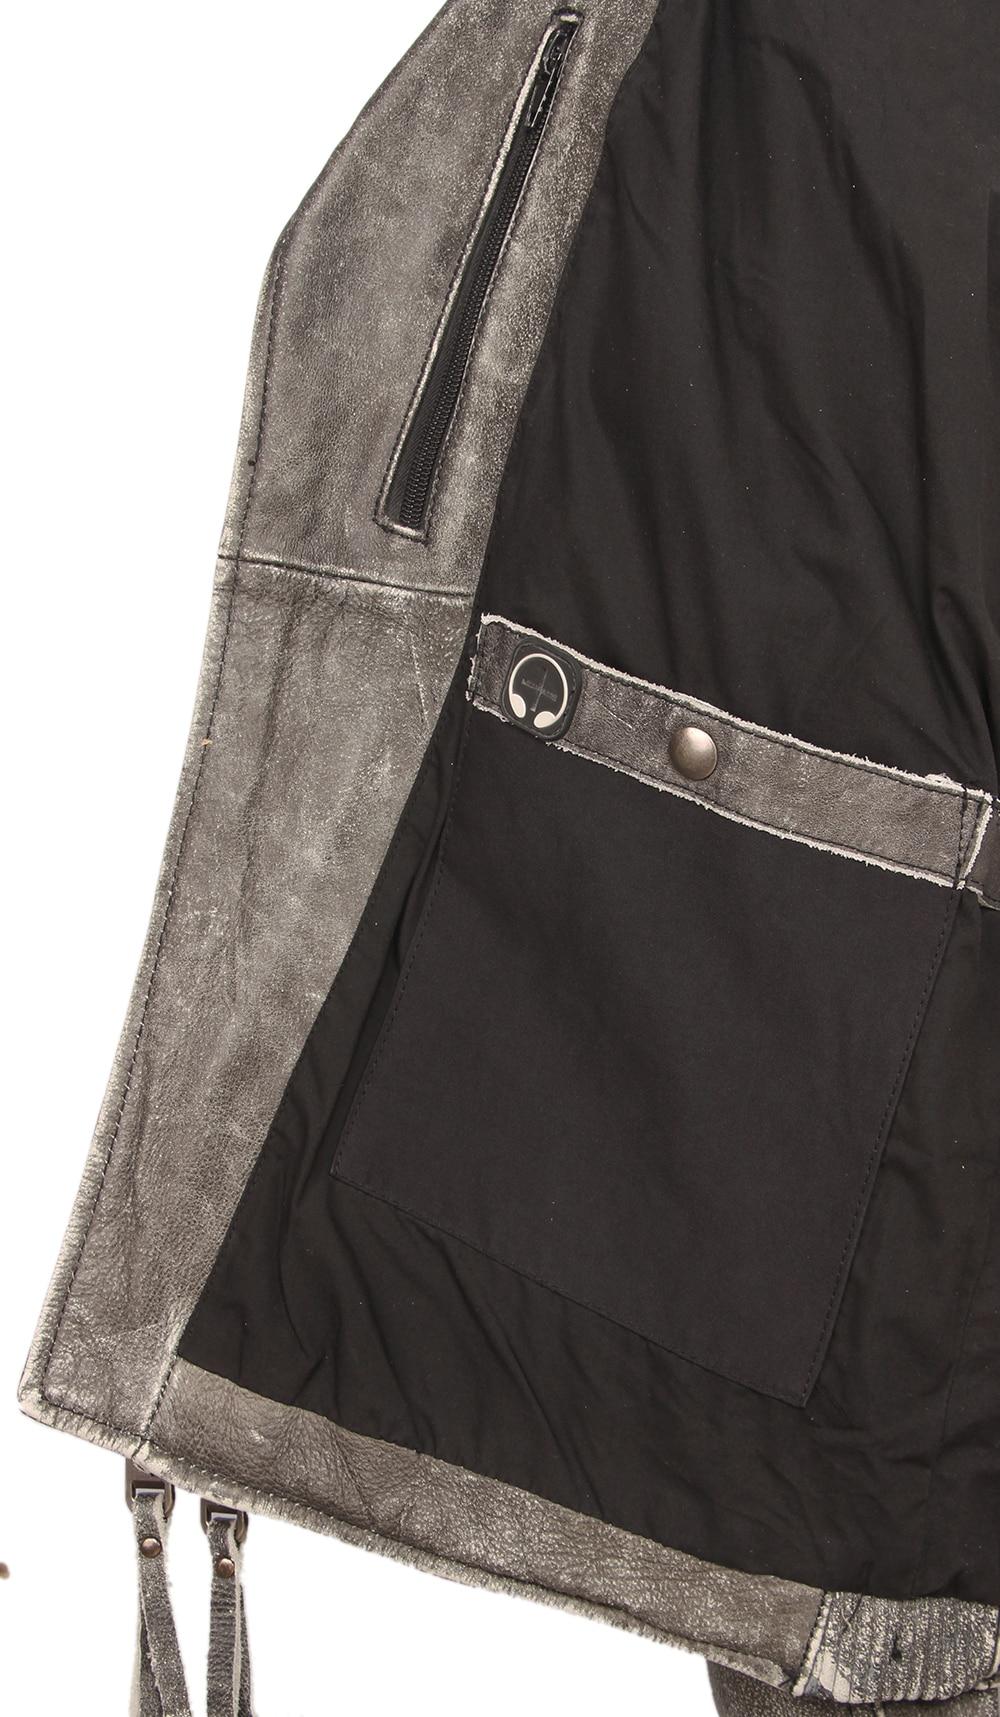 H60ae46428cb541c787464982f2ec1109h Vintage Motorcycle Jacket Slim Fit Thick Men Leather Jacket 100% Cowhide Moto Biker Jacket Man Leather Coat Winter Warm M455